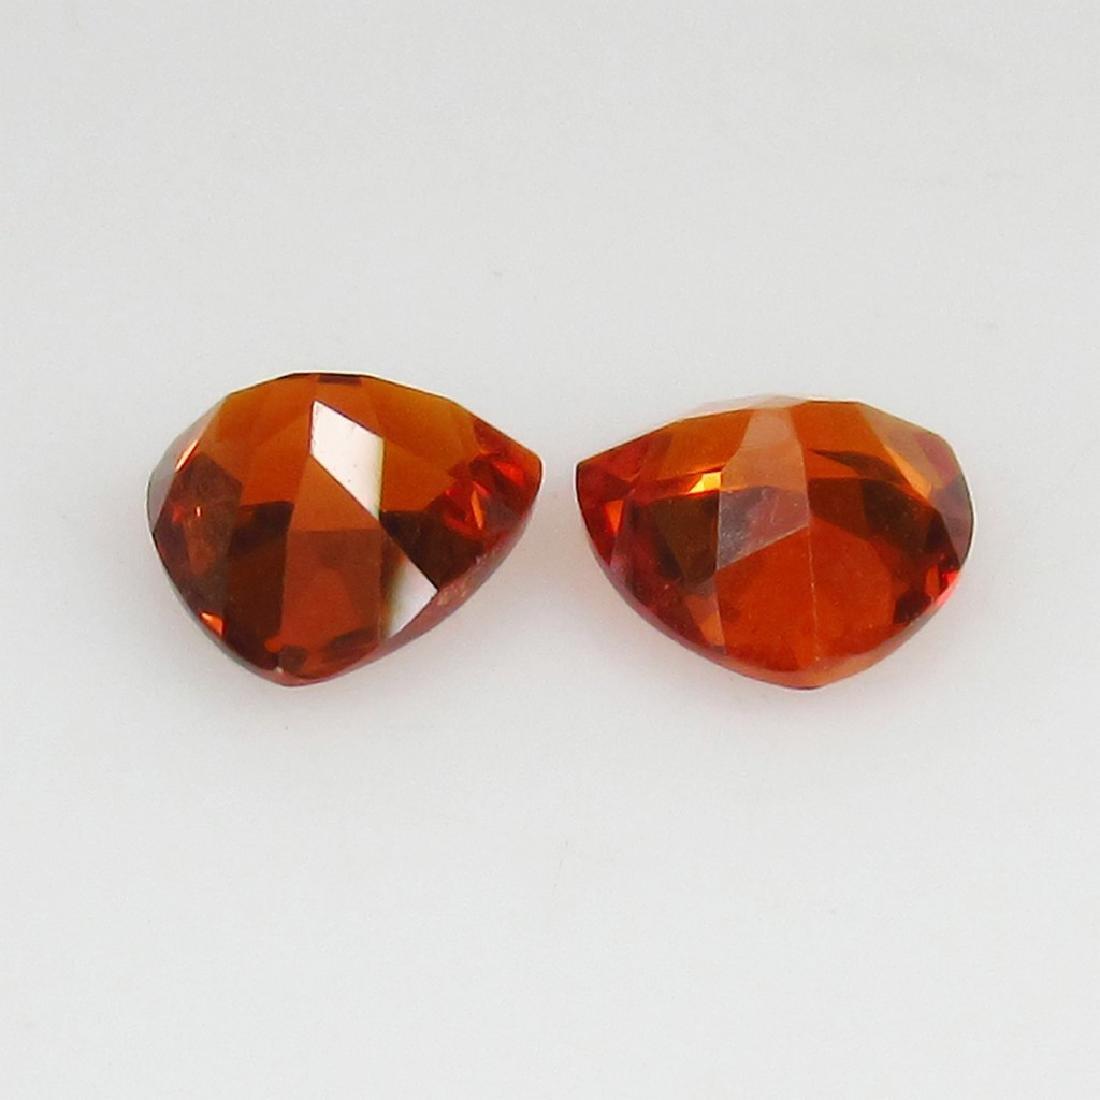 1.26 Ct Genuine Loose Spessartine Garnet Matching - 2